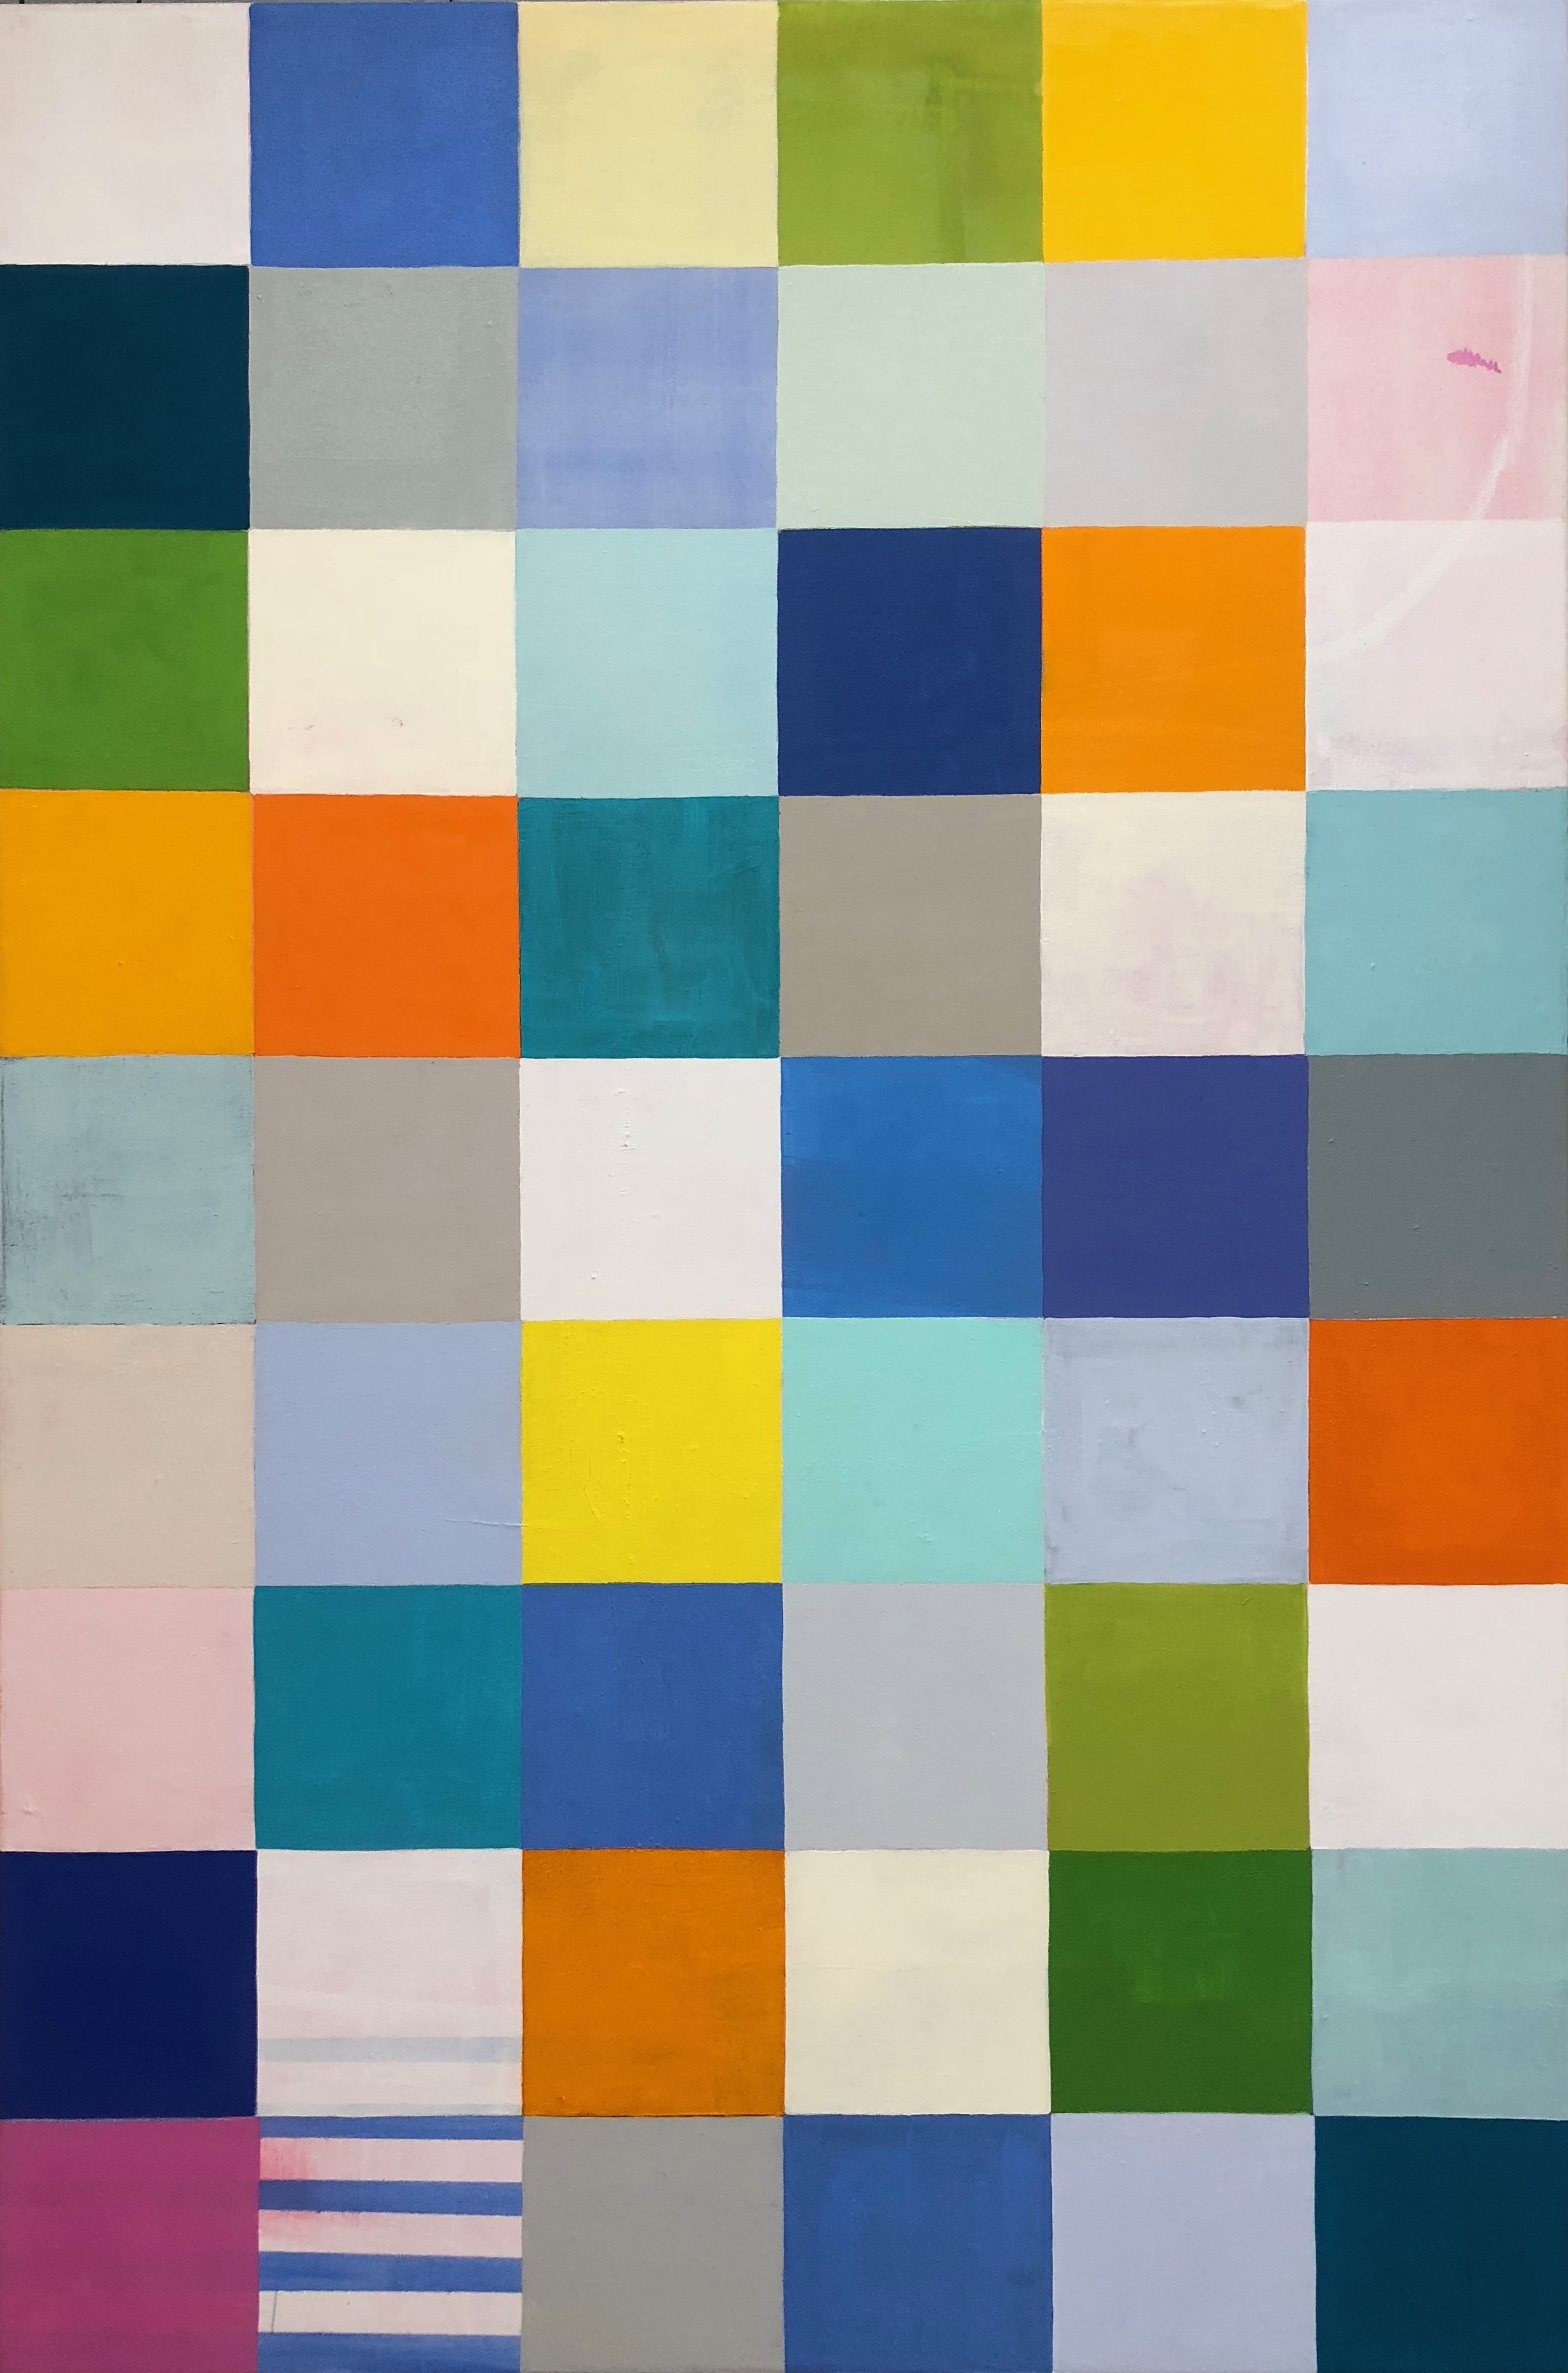 Grid (commission)